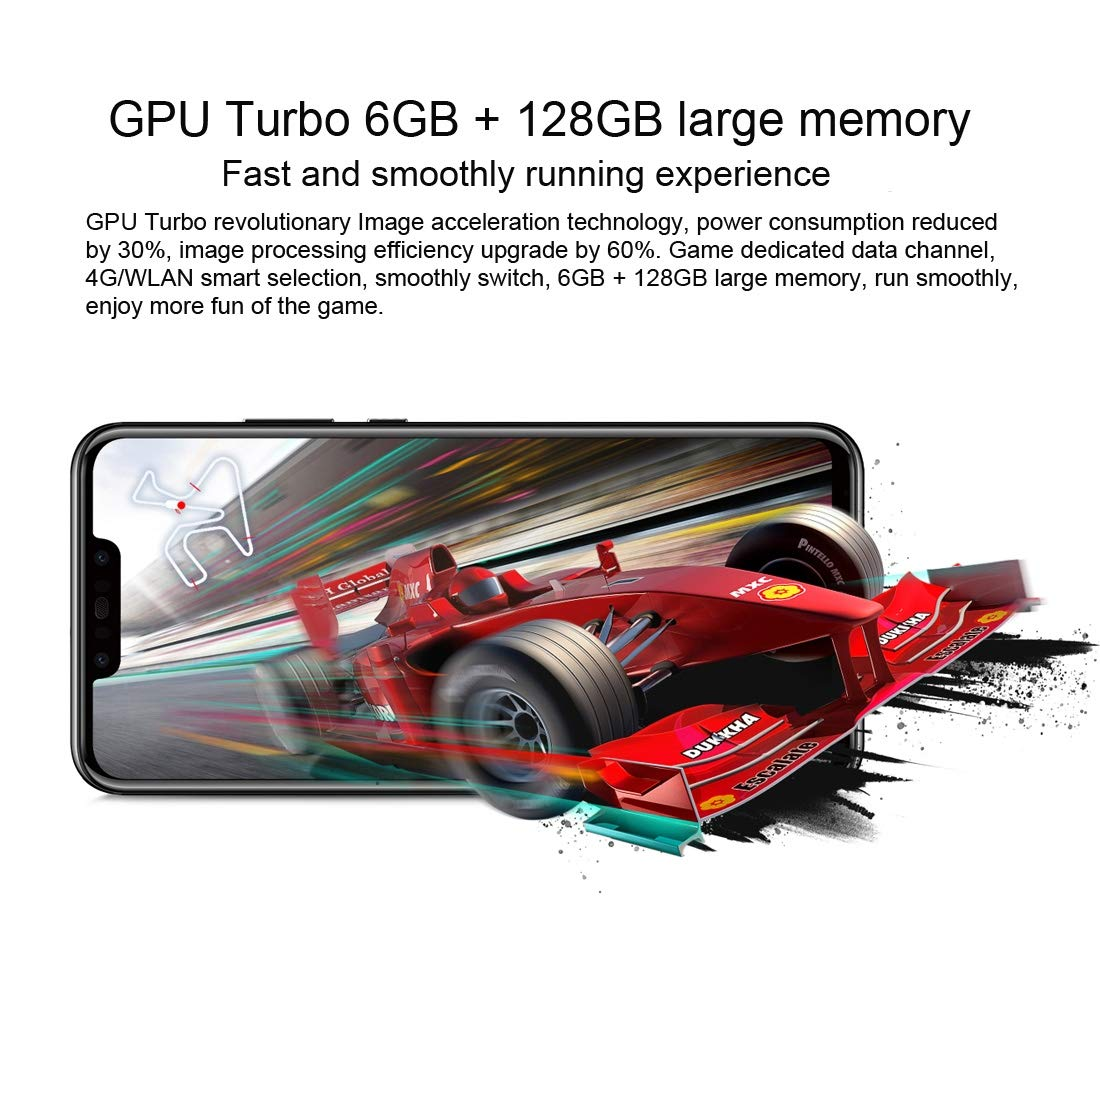 Amazon.com: Huawei nova 3 PAR-AL00 6GB+128GB 6.3 inch Dual Back Cameras + Dual Front Cameras Android 8.1 Kirin 970 Octa Core GSM & WCDMA & FDD-LTE (Jet ...